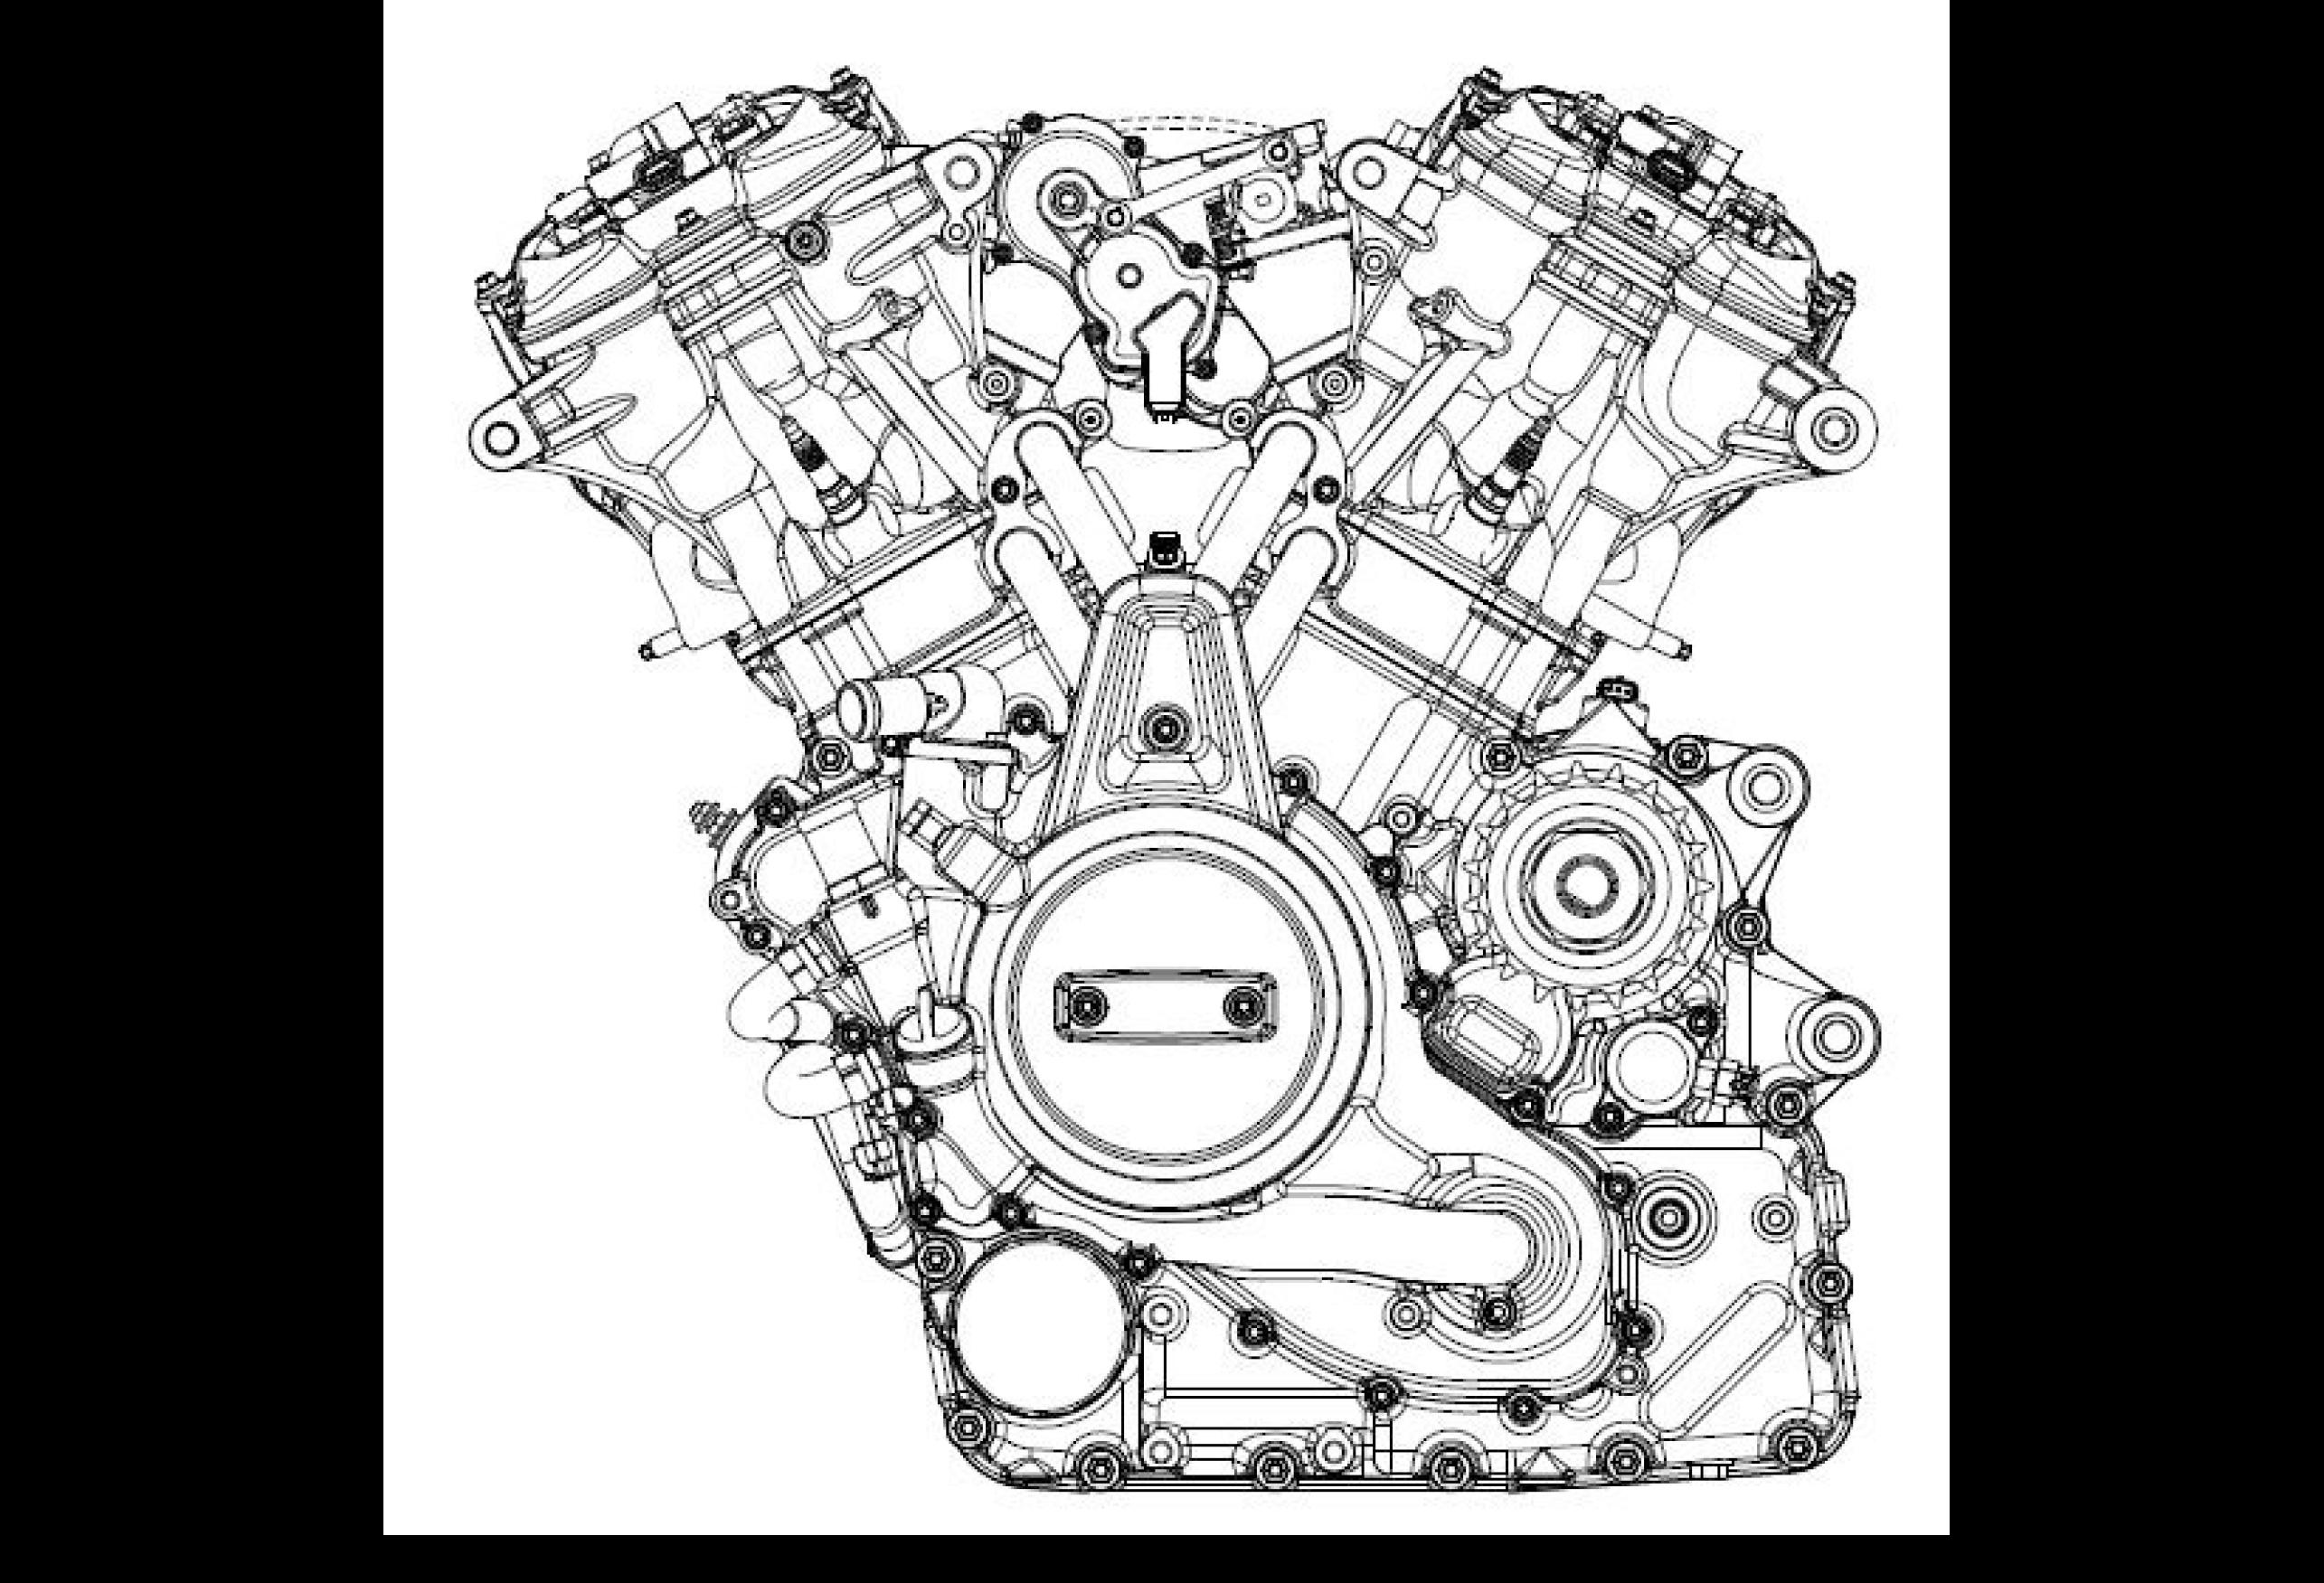 040419-harley-davidson-new-60-degree-v-twin-engine-0001-fig-7